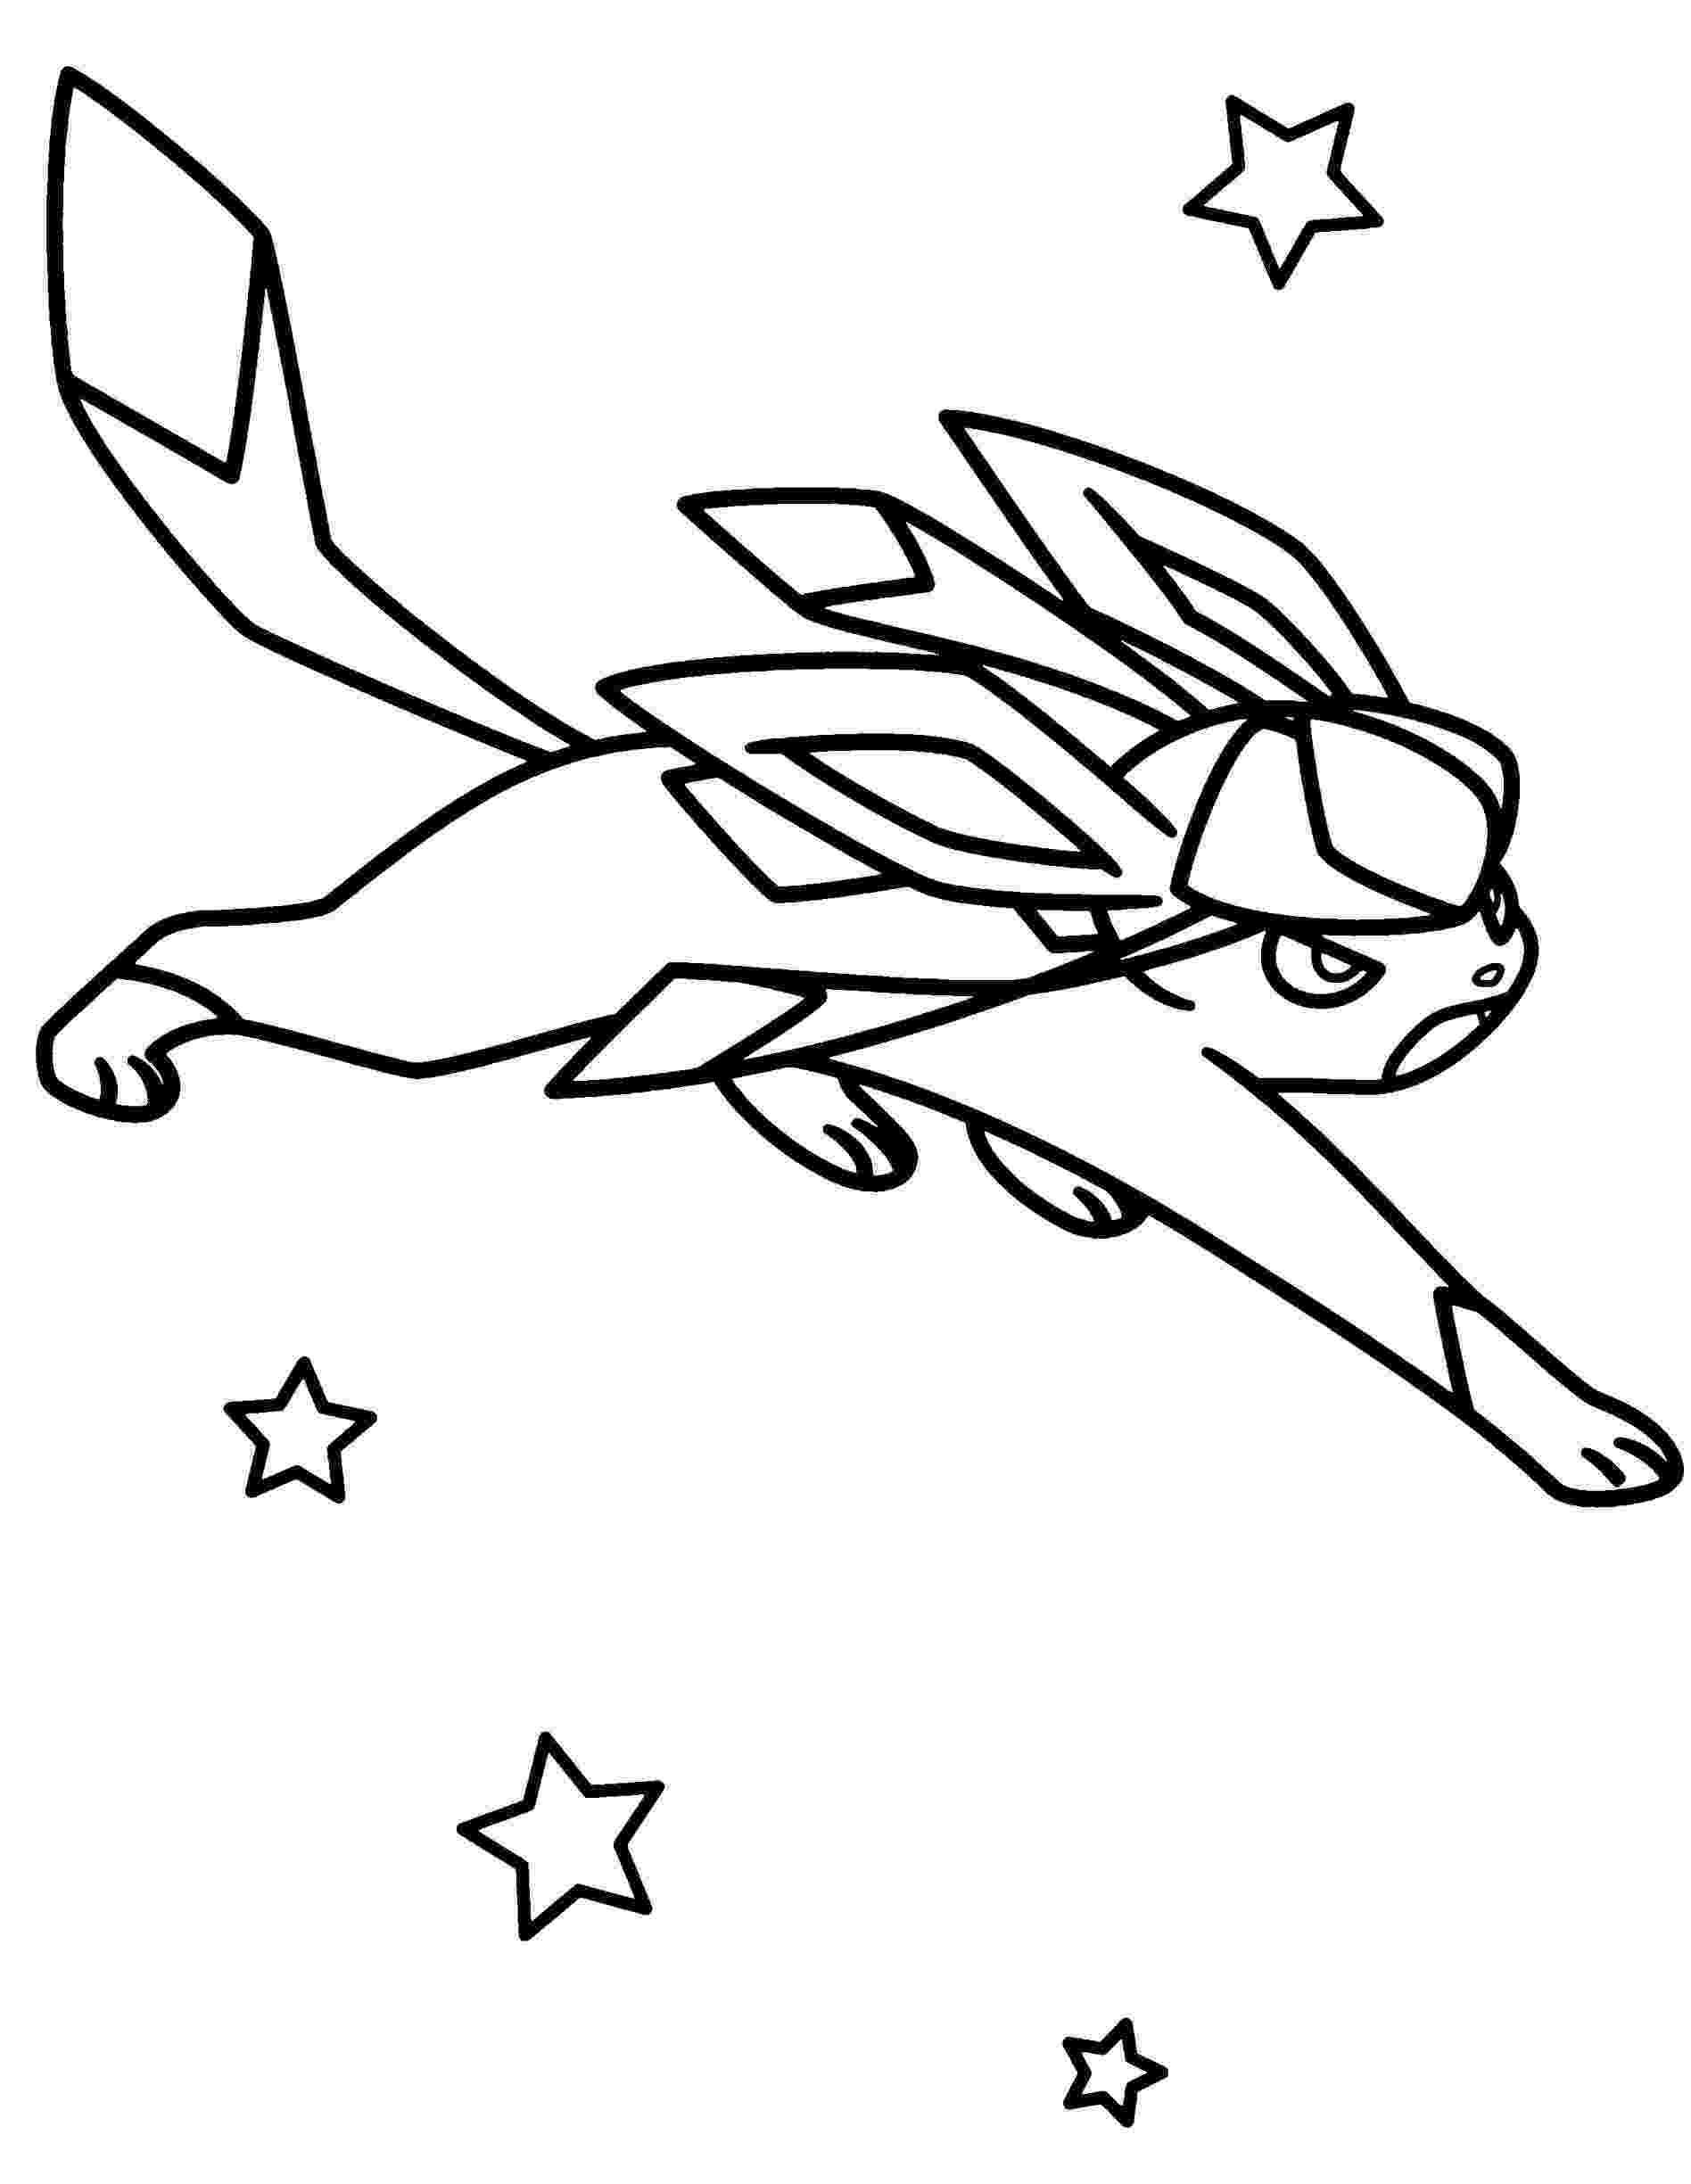 pokemon coloring pages eevee evolutions glaceon pokemon coloring pages eevee evolutions at getdrawings evolutions pages pokemon coloring glaceon eevee